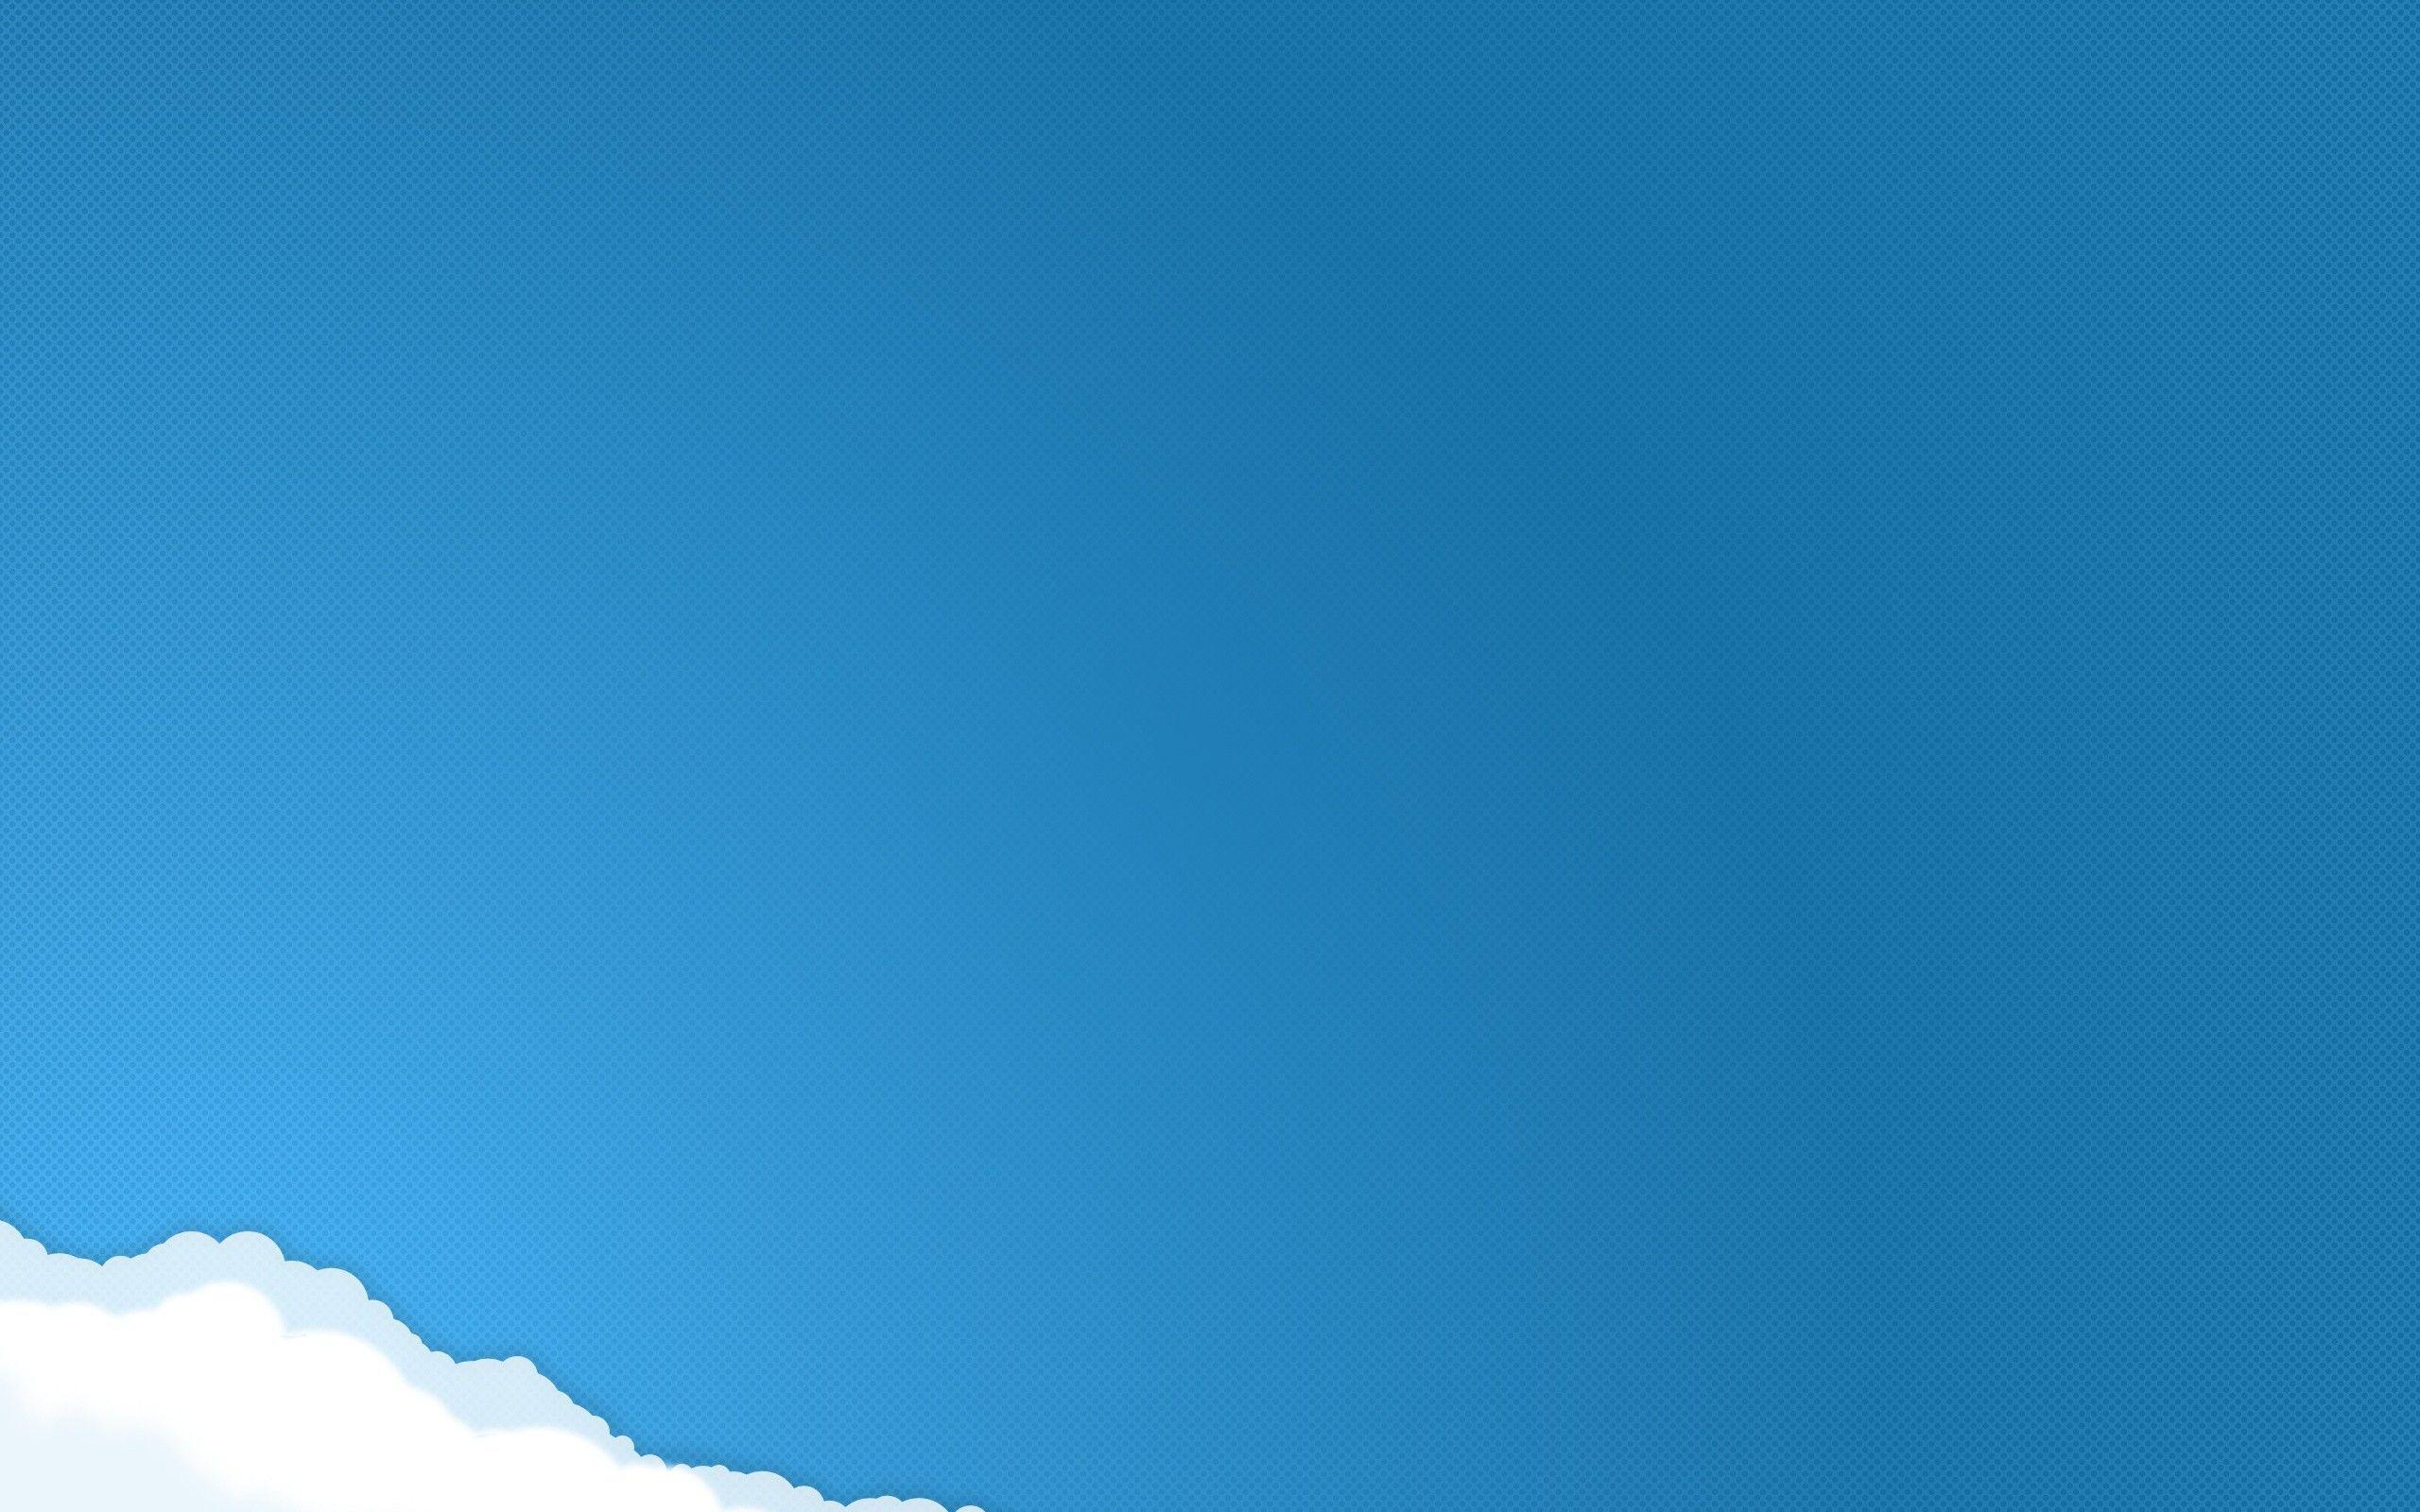 Plain Blue Backgrounds Wallpapers 2560x1600